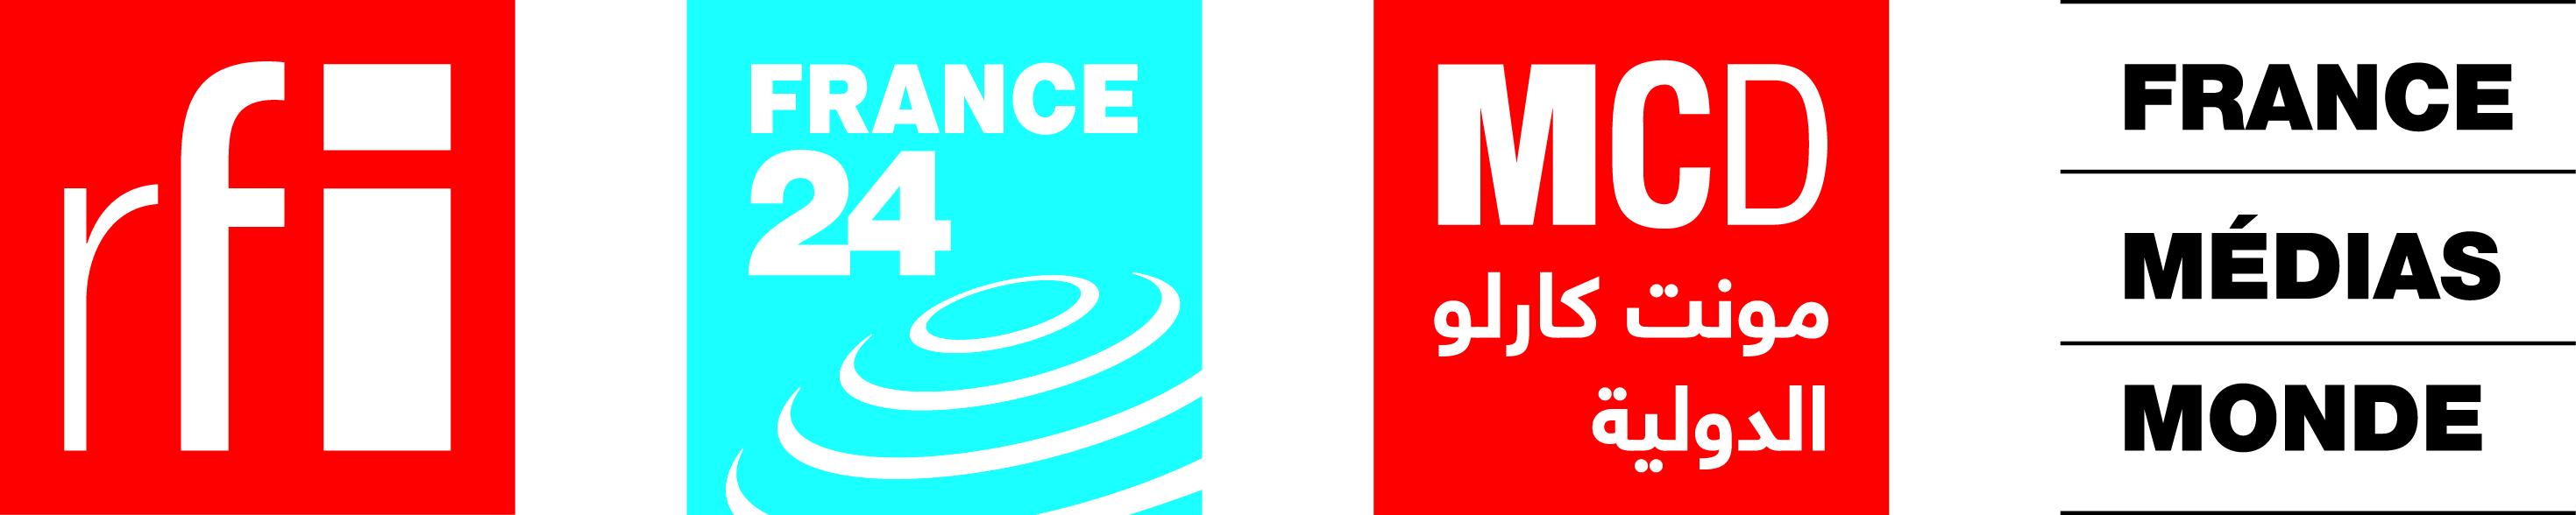 PRIX SAIMA pour la creation contemporaine arabe